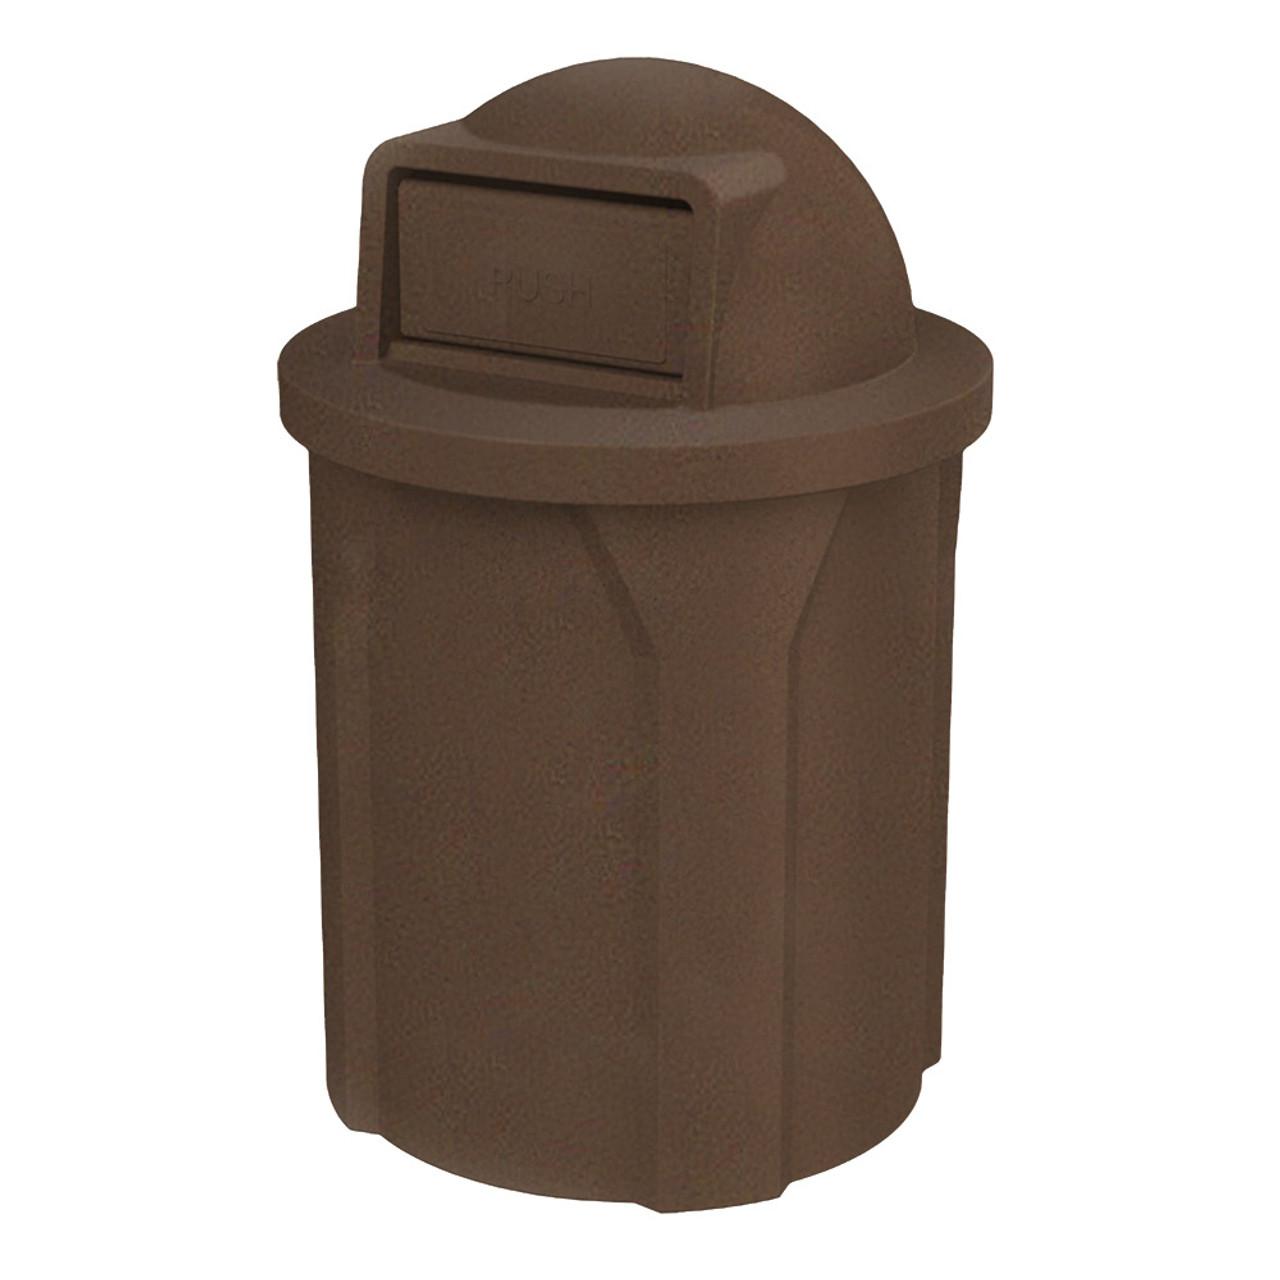 42 Gallon Kolor Can Push Door School Trash Receptacle S7101A-00 BROWN GRANITE